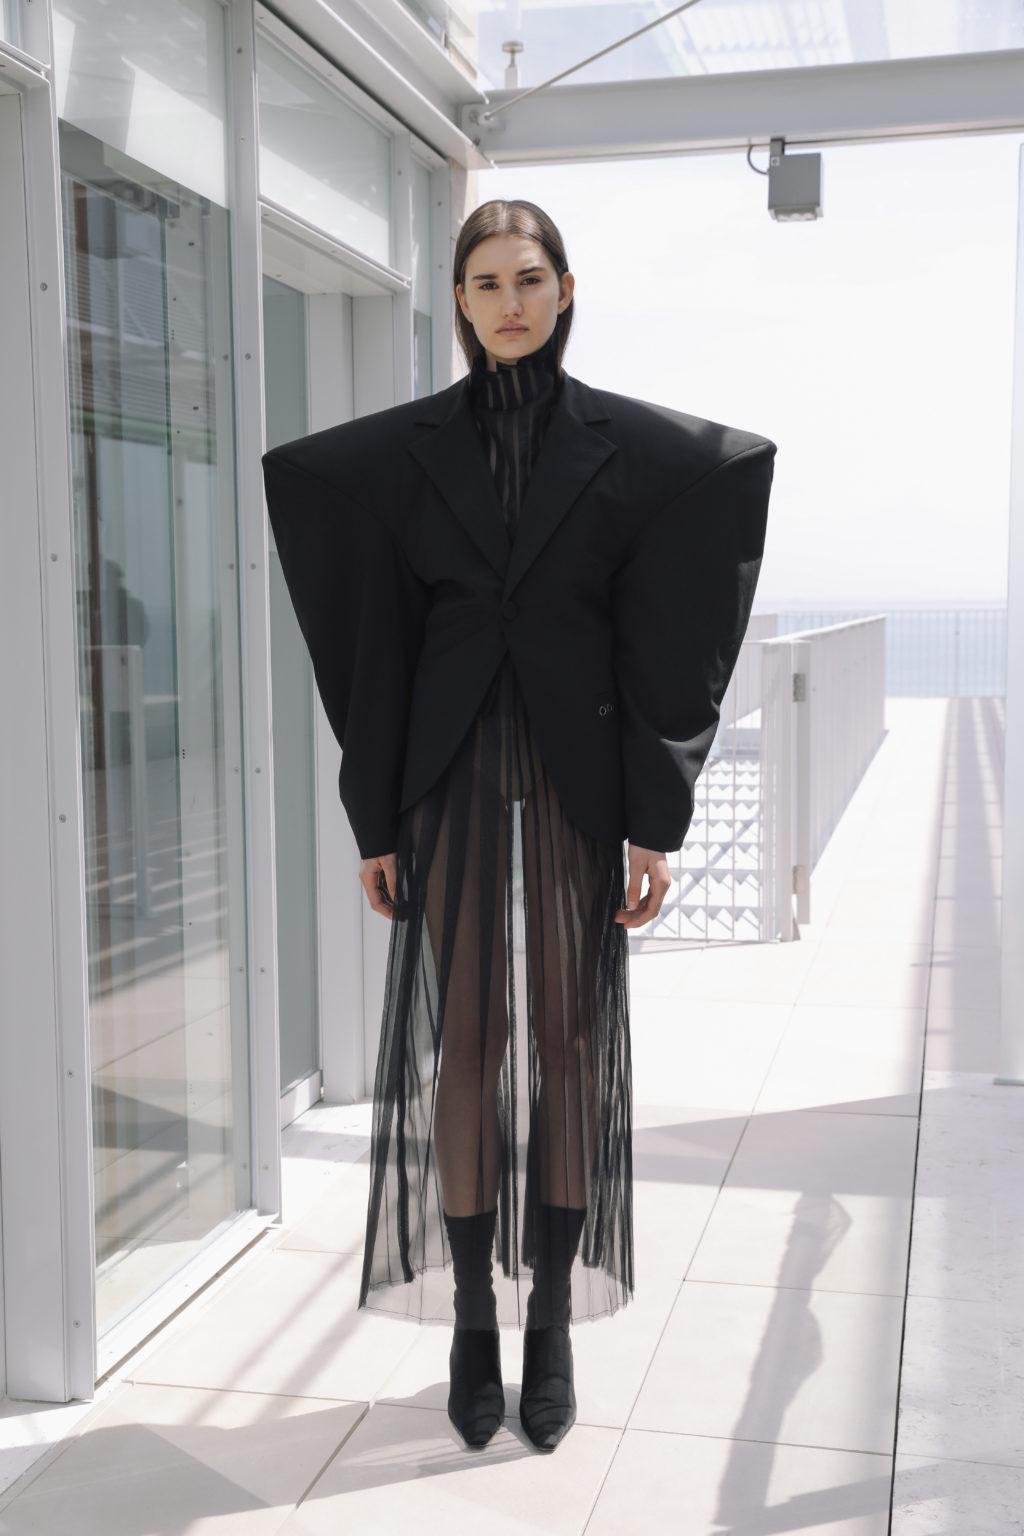 Lisboa Fashion Week 2021